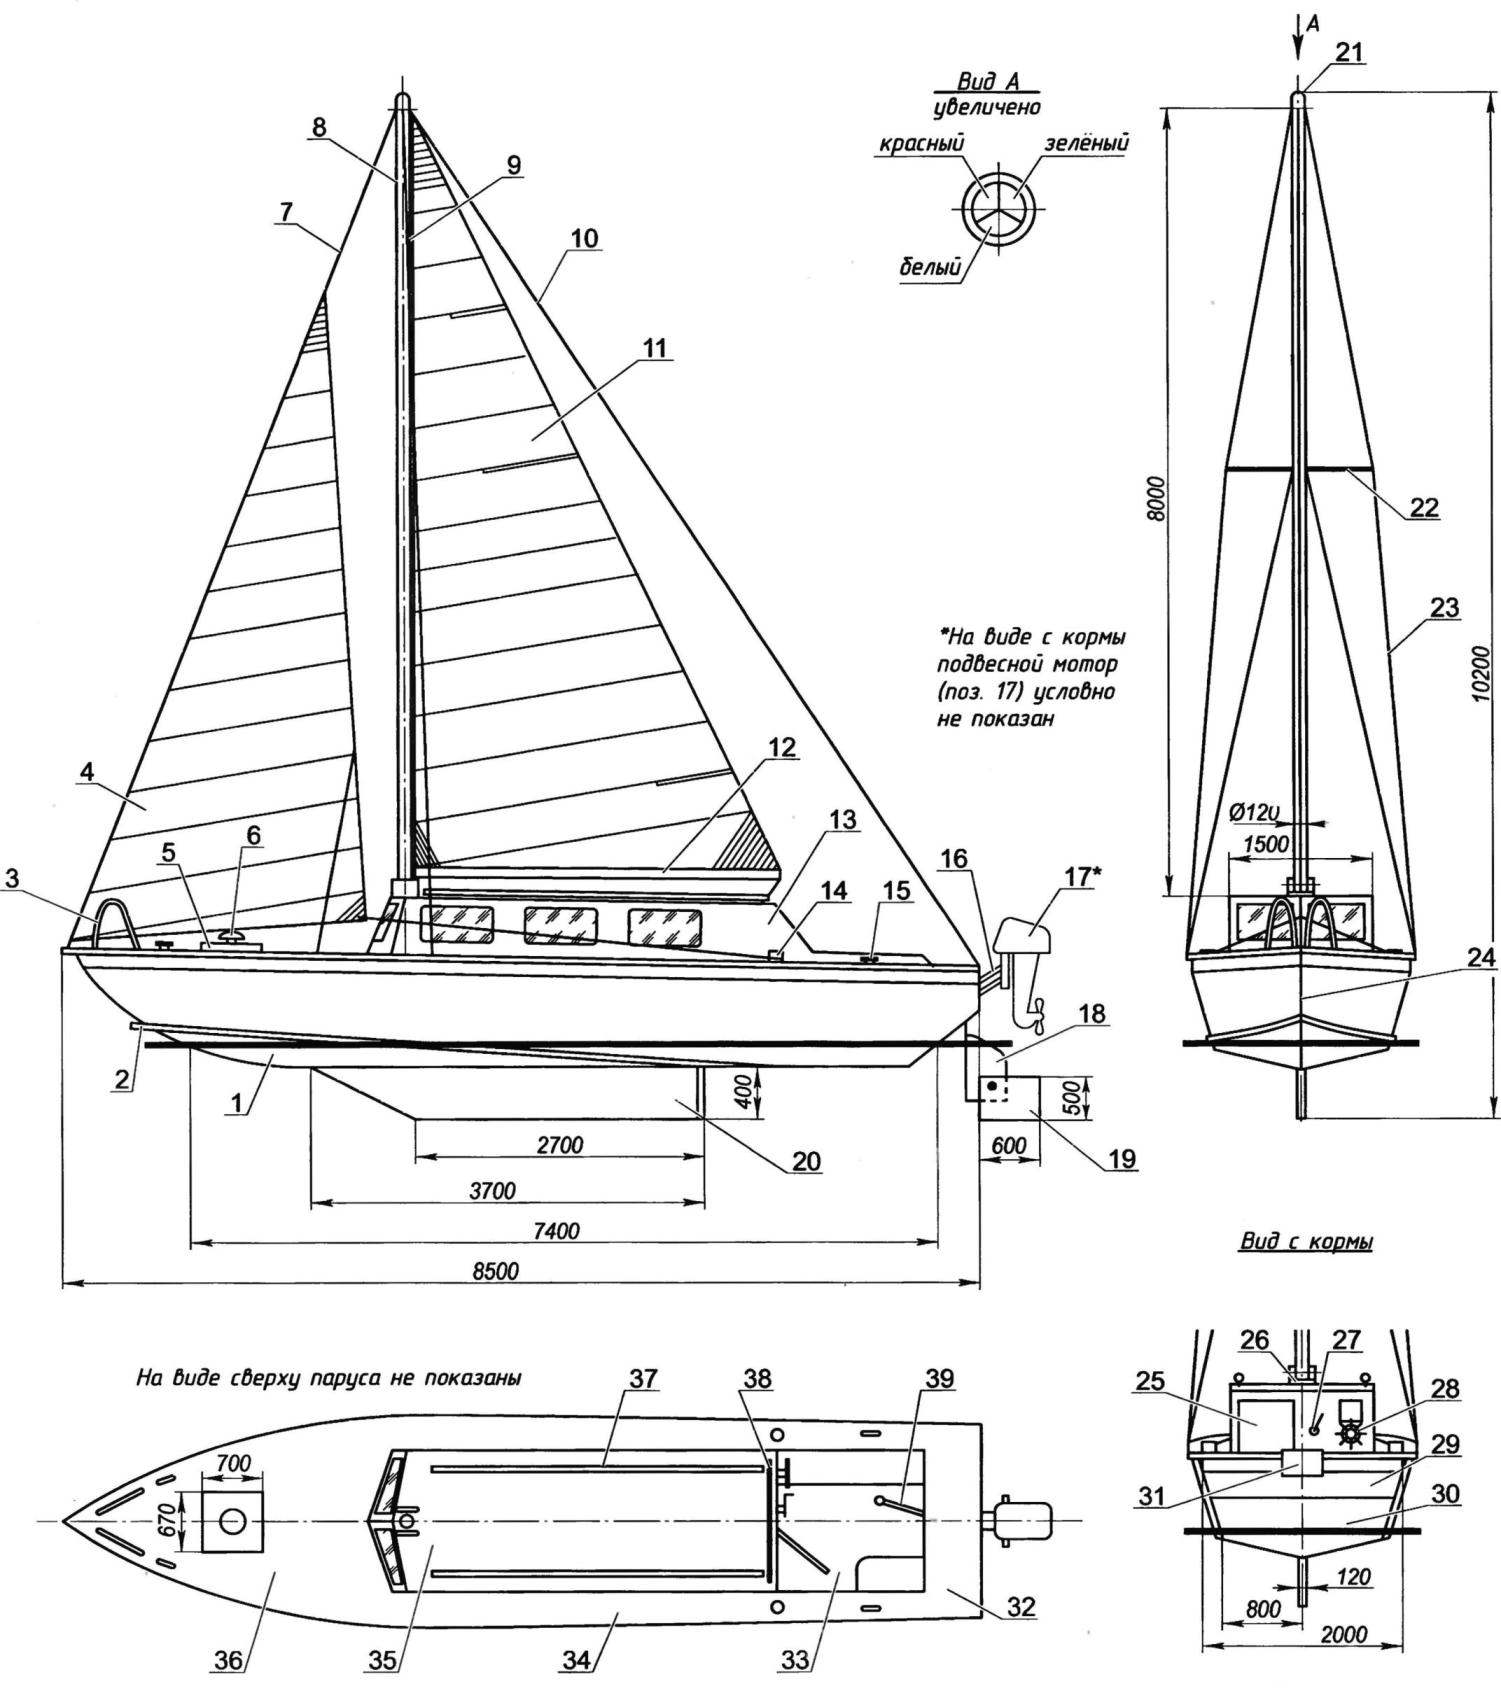 Парусно-моторное судно «БАС»